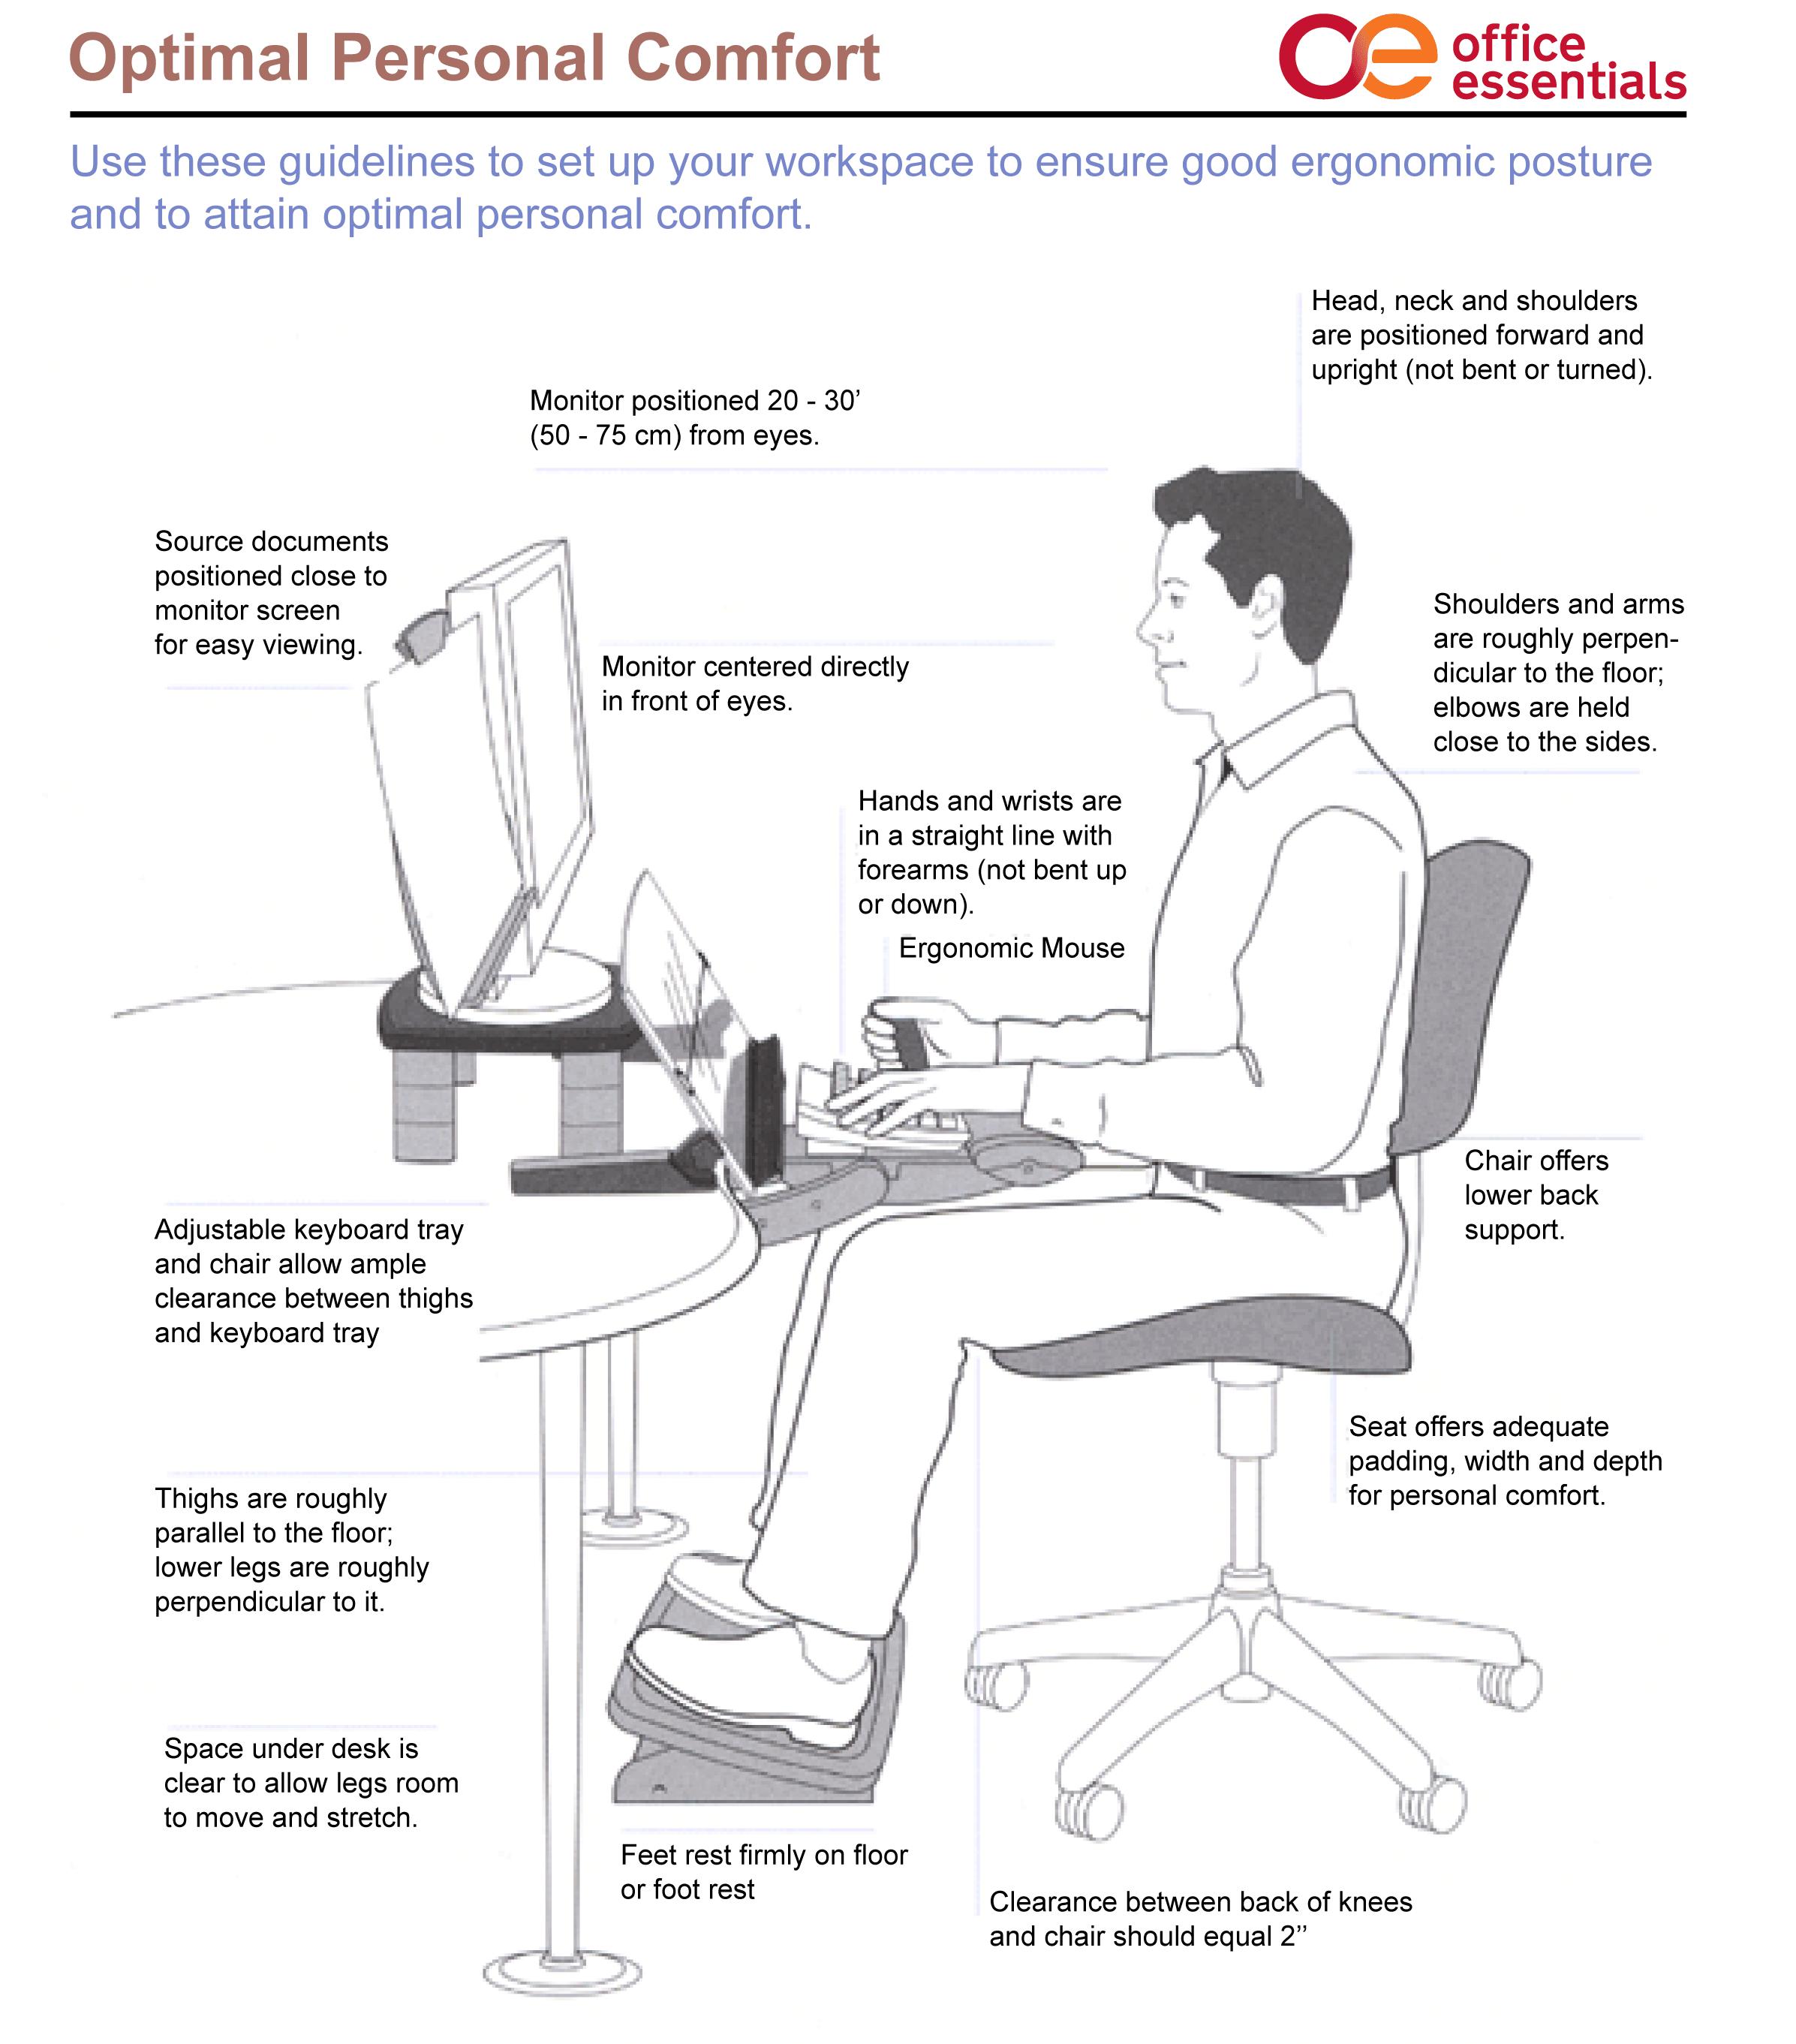 Ergonomic tips for optimal comfort at work